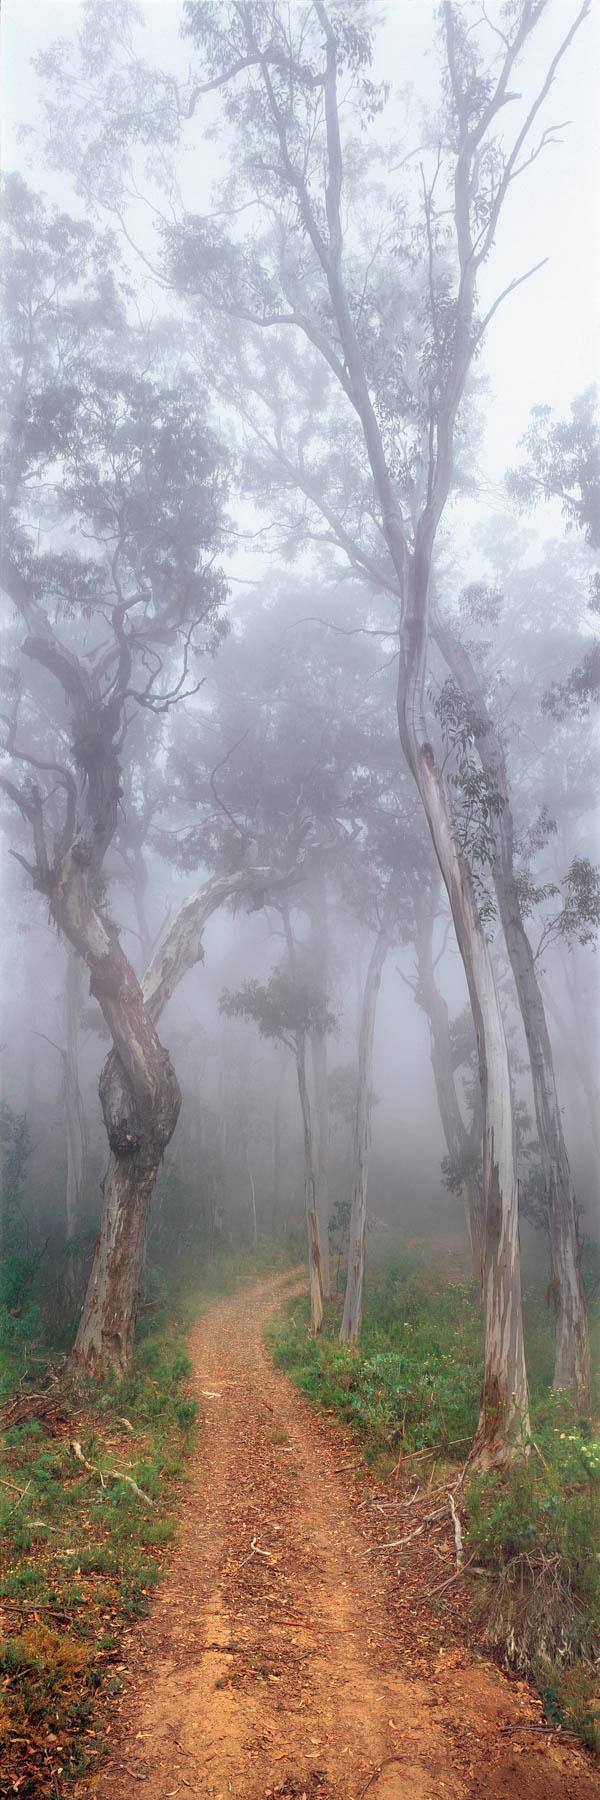 Snow Gums shrouded in mist beside a dirt track, Victoria, Australia.